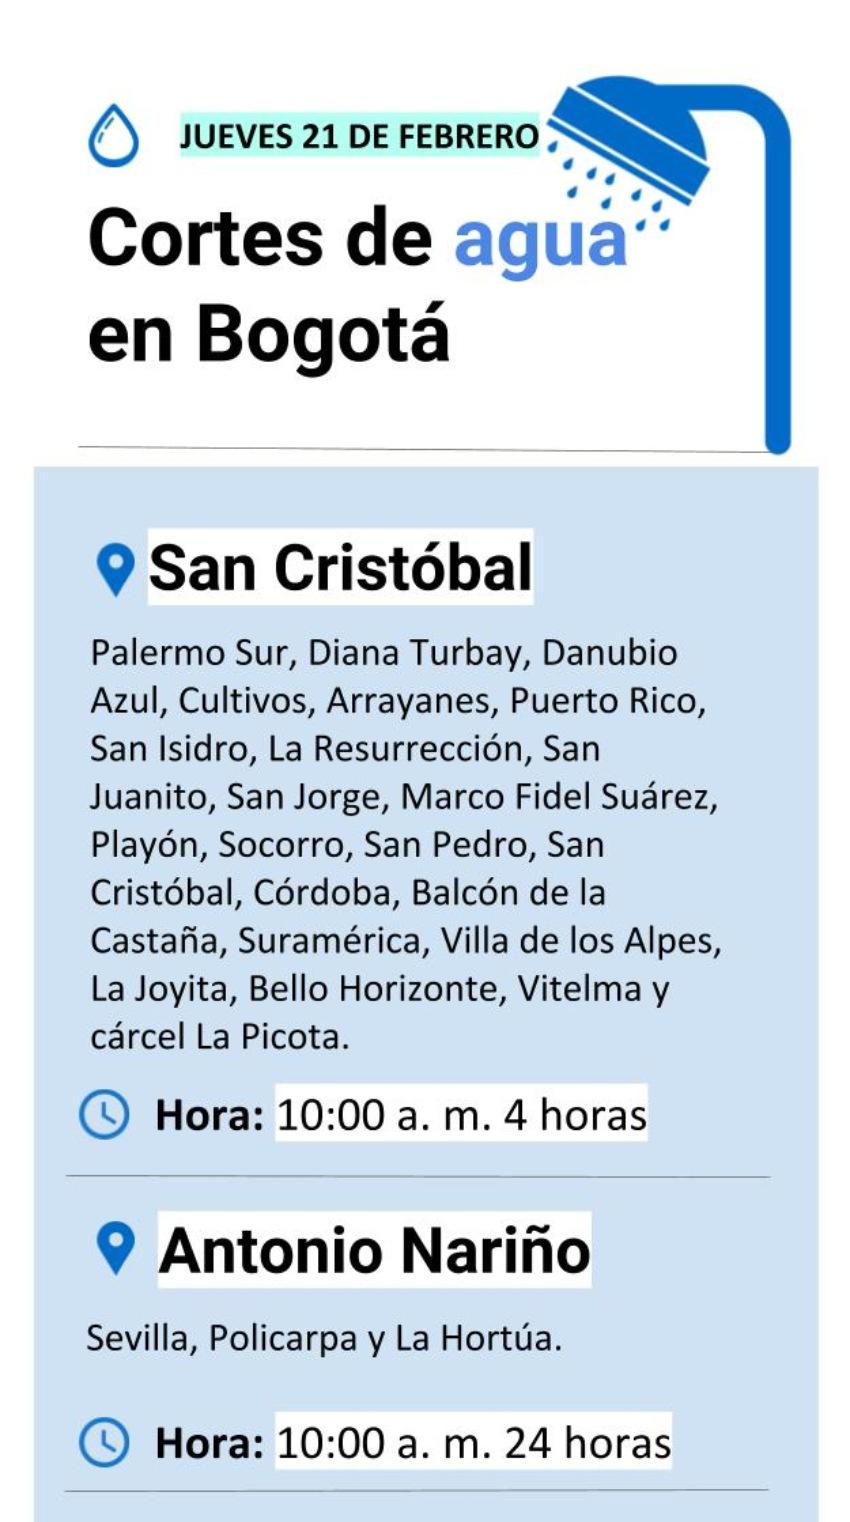 Cortes de agua en Bogotá jueves 21 de febrero